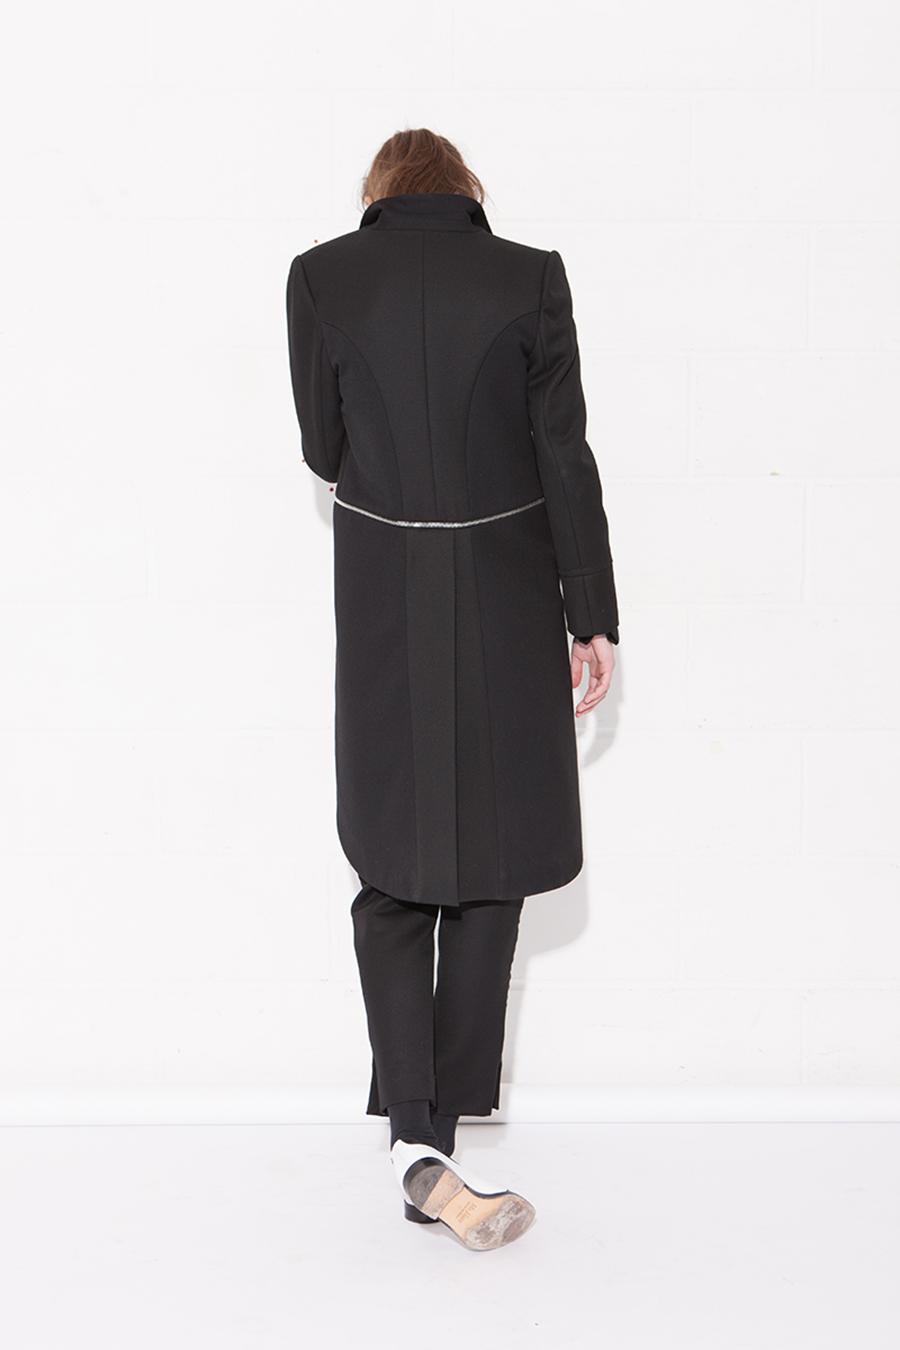 Tail coat, dress trousers 3.jpg